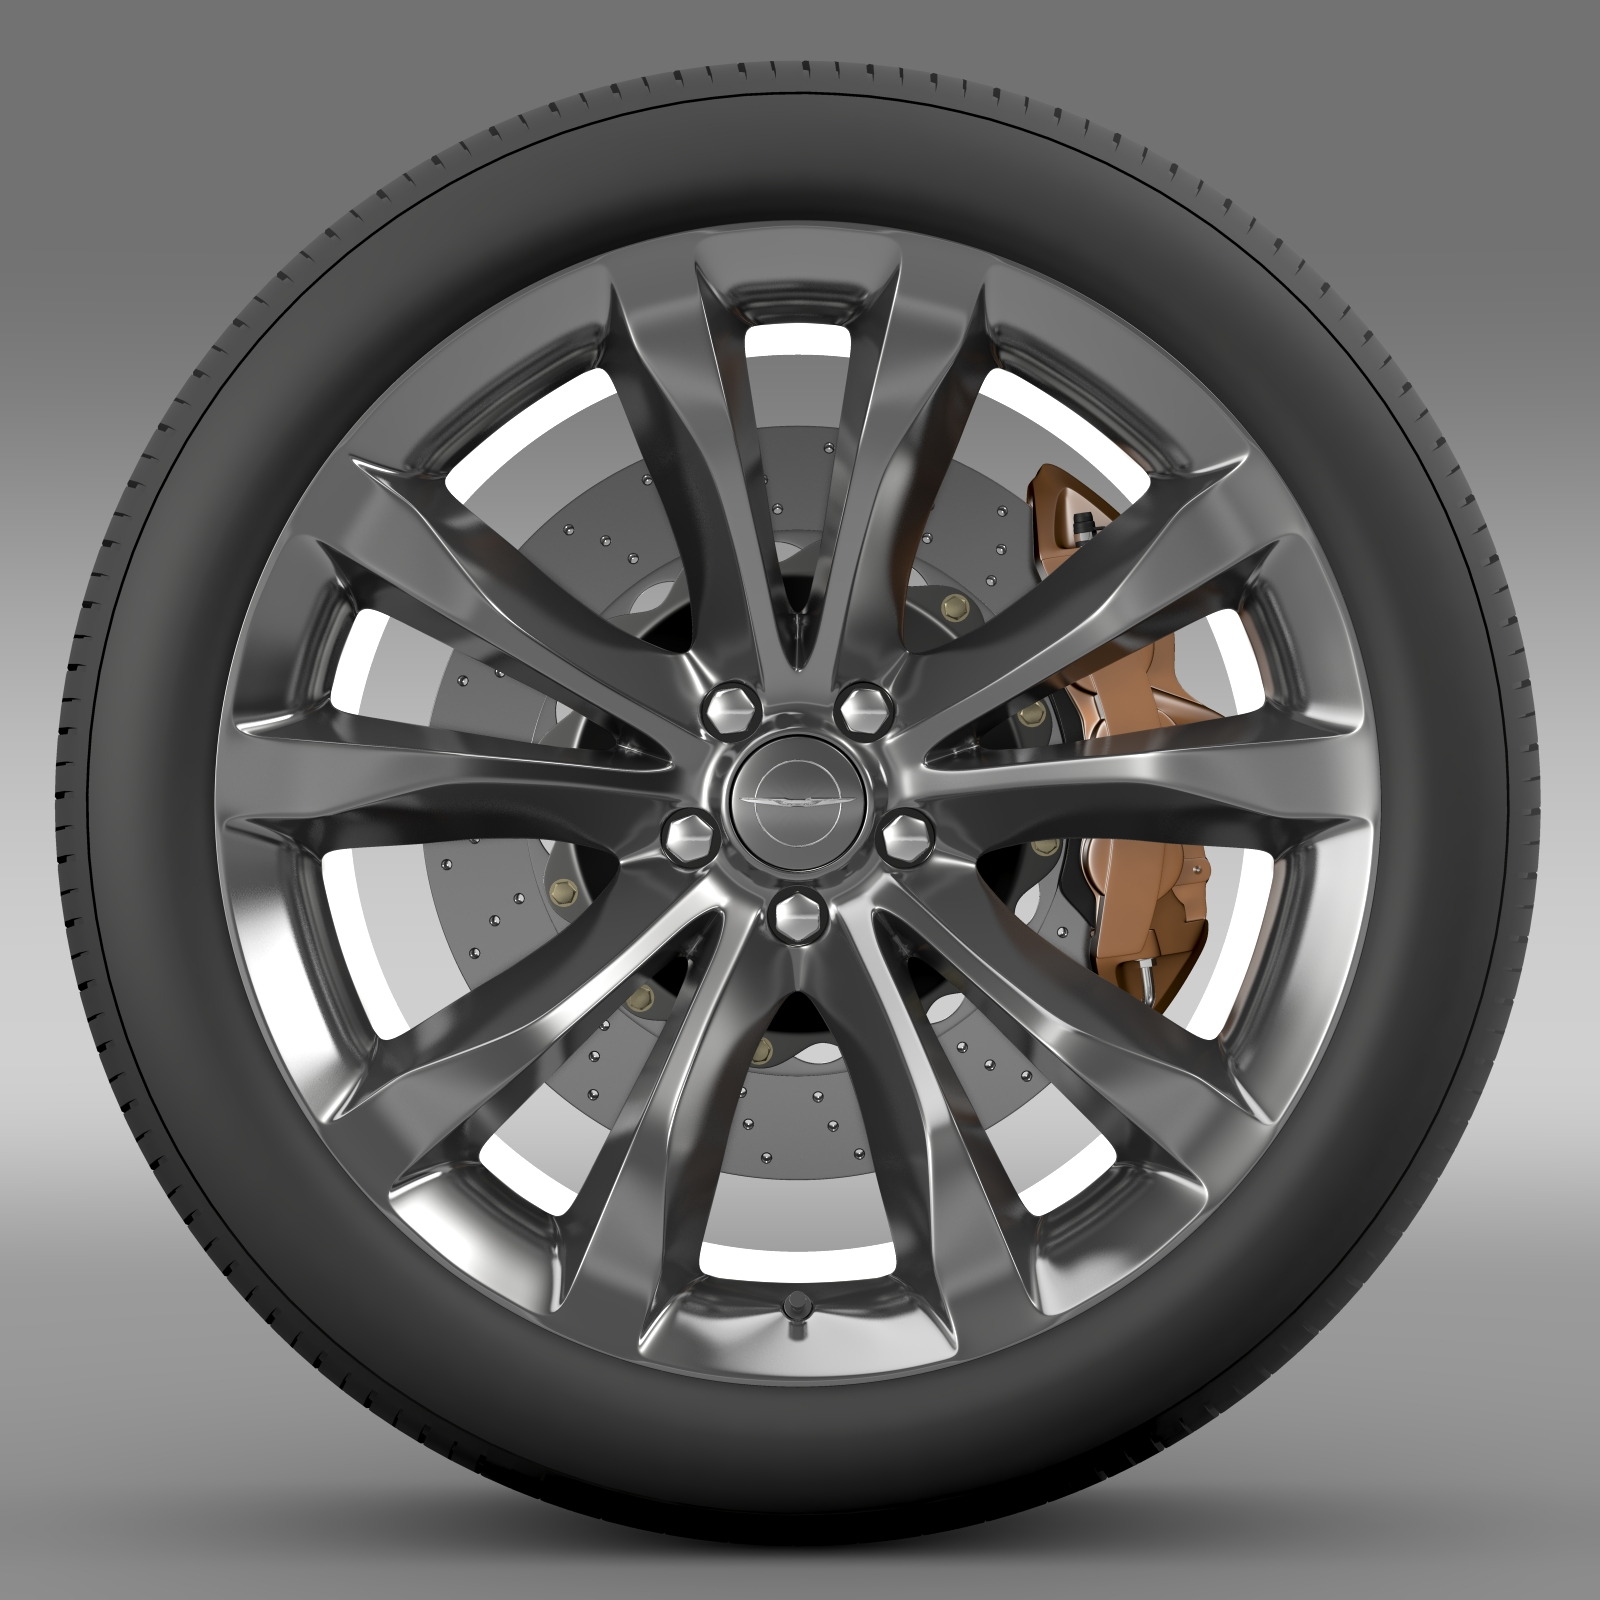 chrysler 300c platinum 2015 wheel 3d model 3ds max fbx c4d lwo ma mb hrc xsi obj 212777